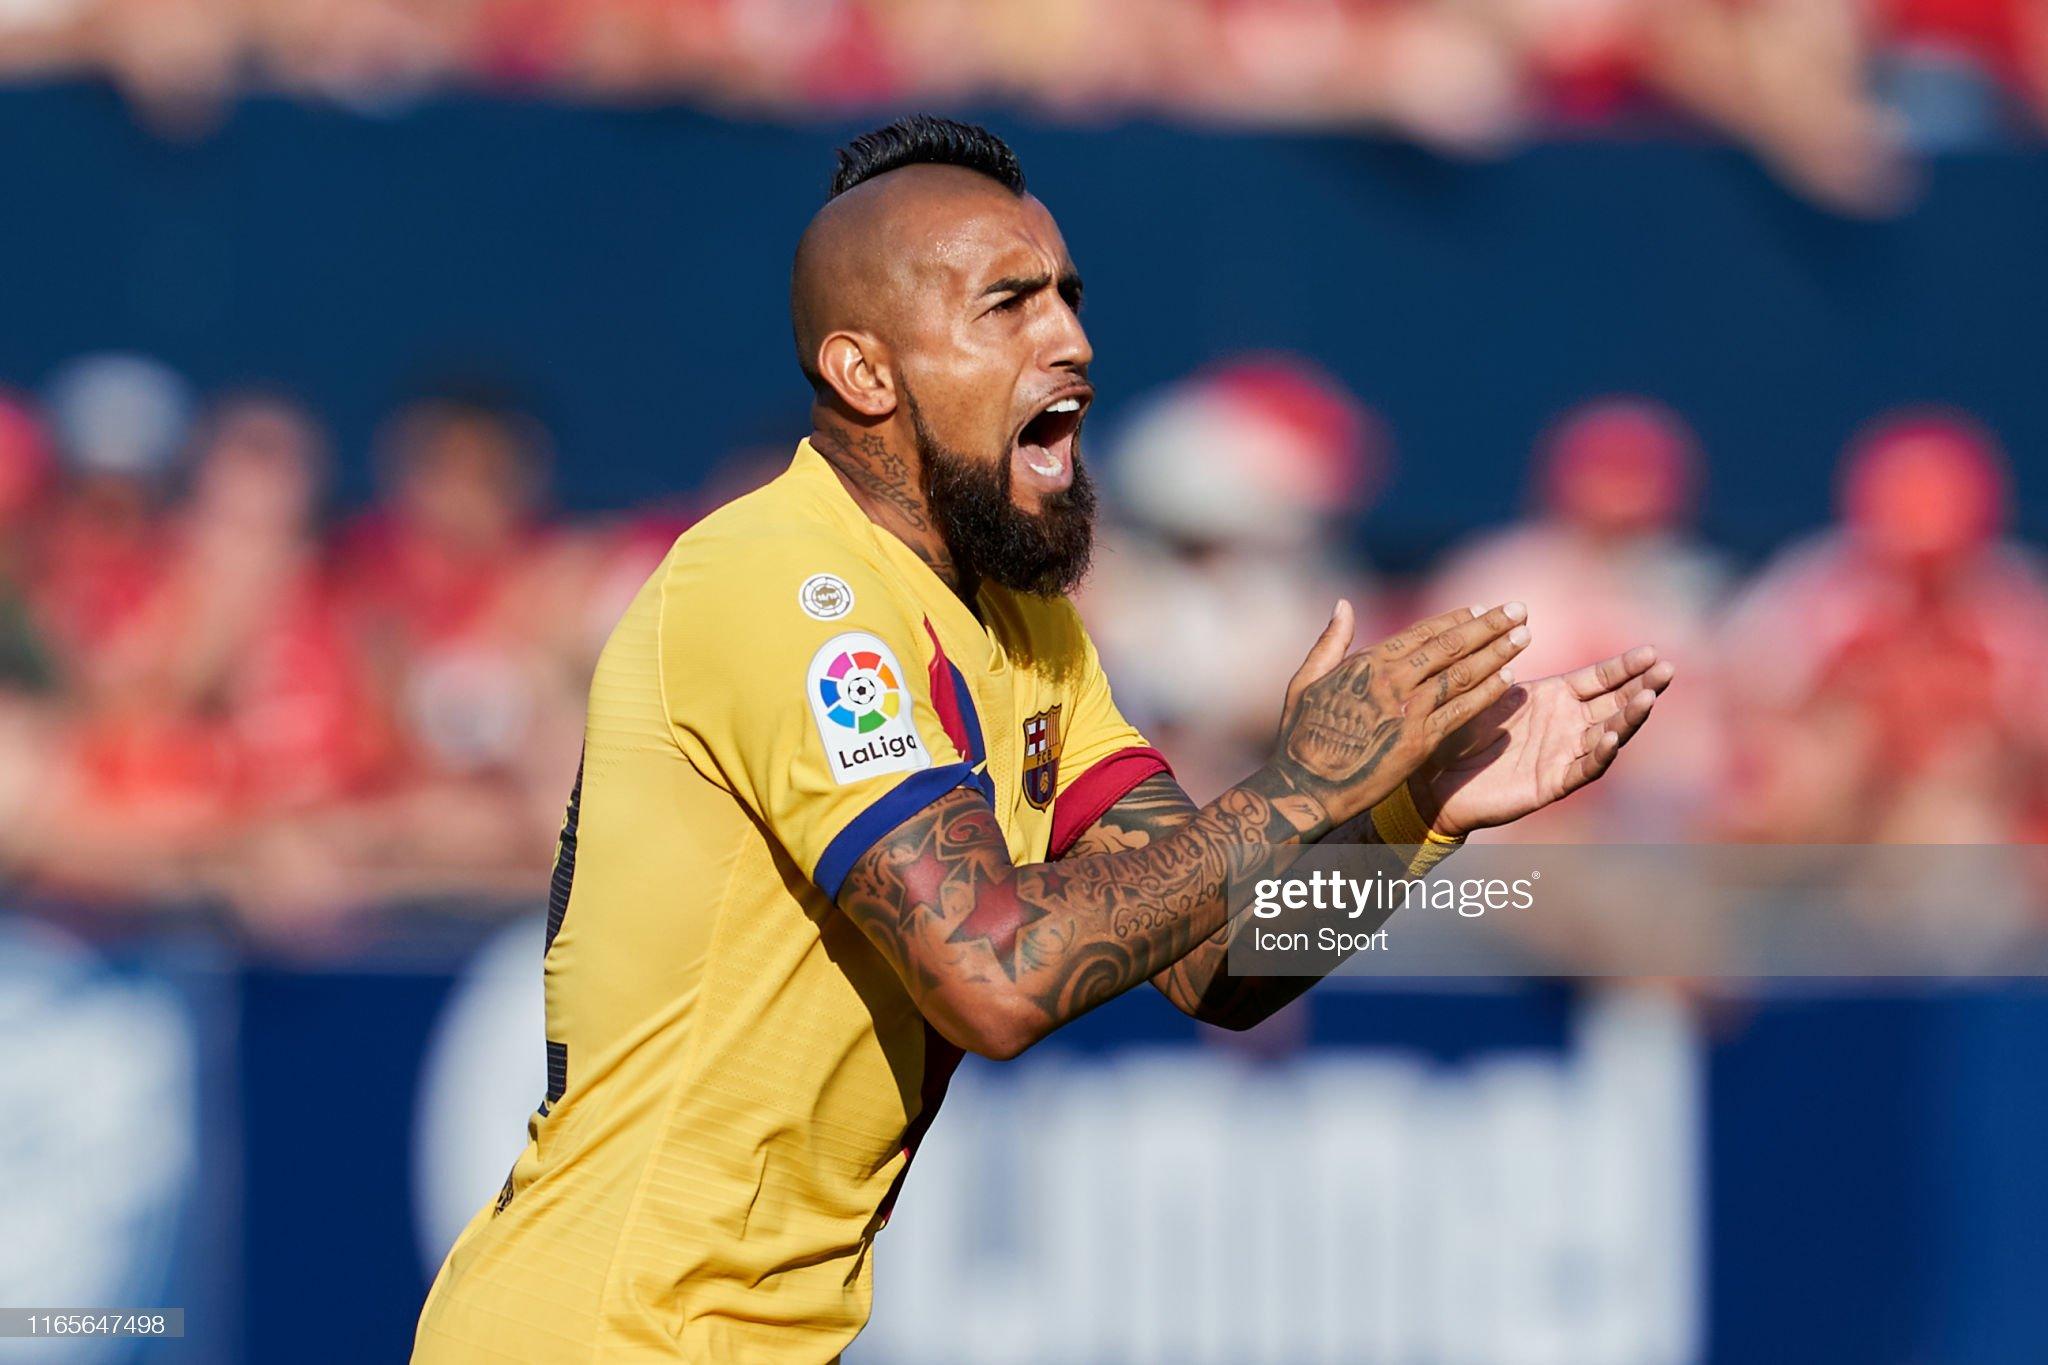 صور مباراة : أوساسونا - برشلونة 2-2 ( 31-08-2019 )  Arturo-vidal-of-fc-barcelona-during-the-liga-match-between-osasuna-picture-id1165647498?s=2048x2048